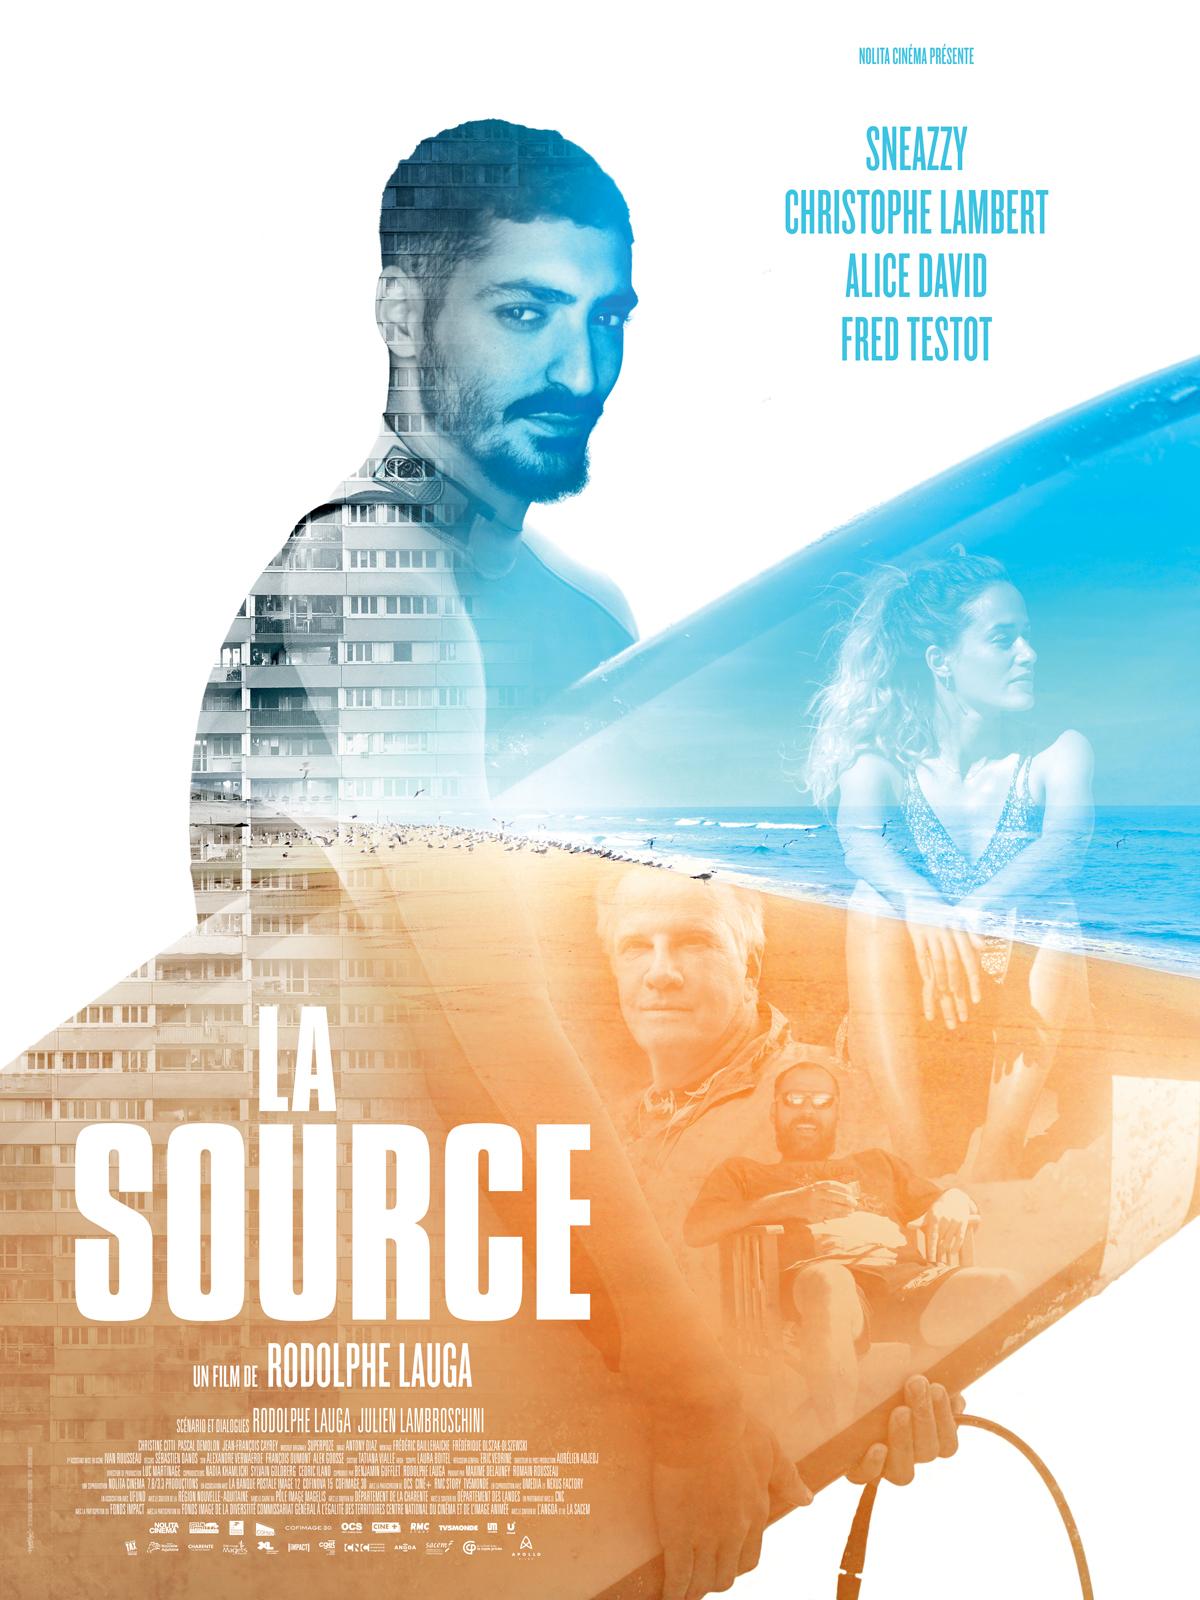 http://rss.allocine.fr/~r/ac/cine/cettesemaine/~3/Cr1QNOWgu78/fichefilm_gen_cfilm=268405.html